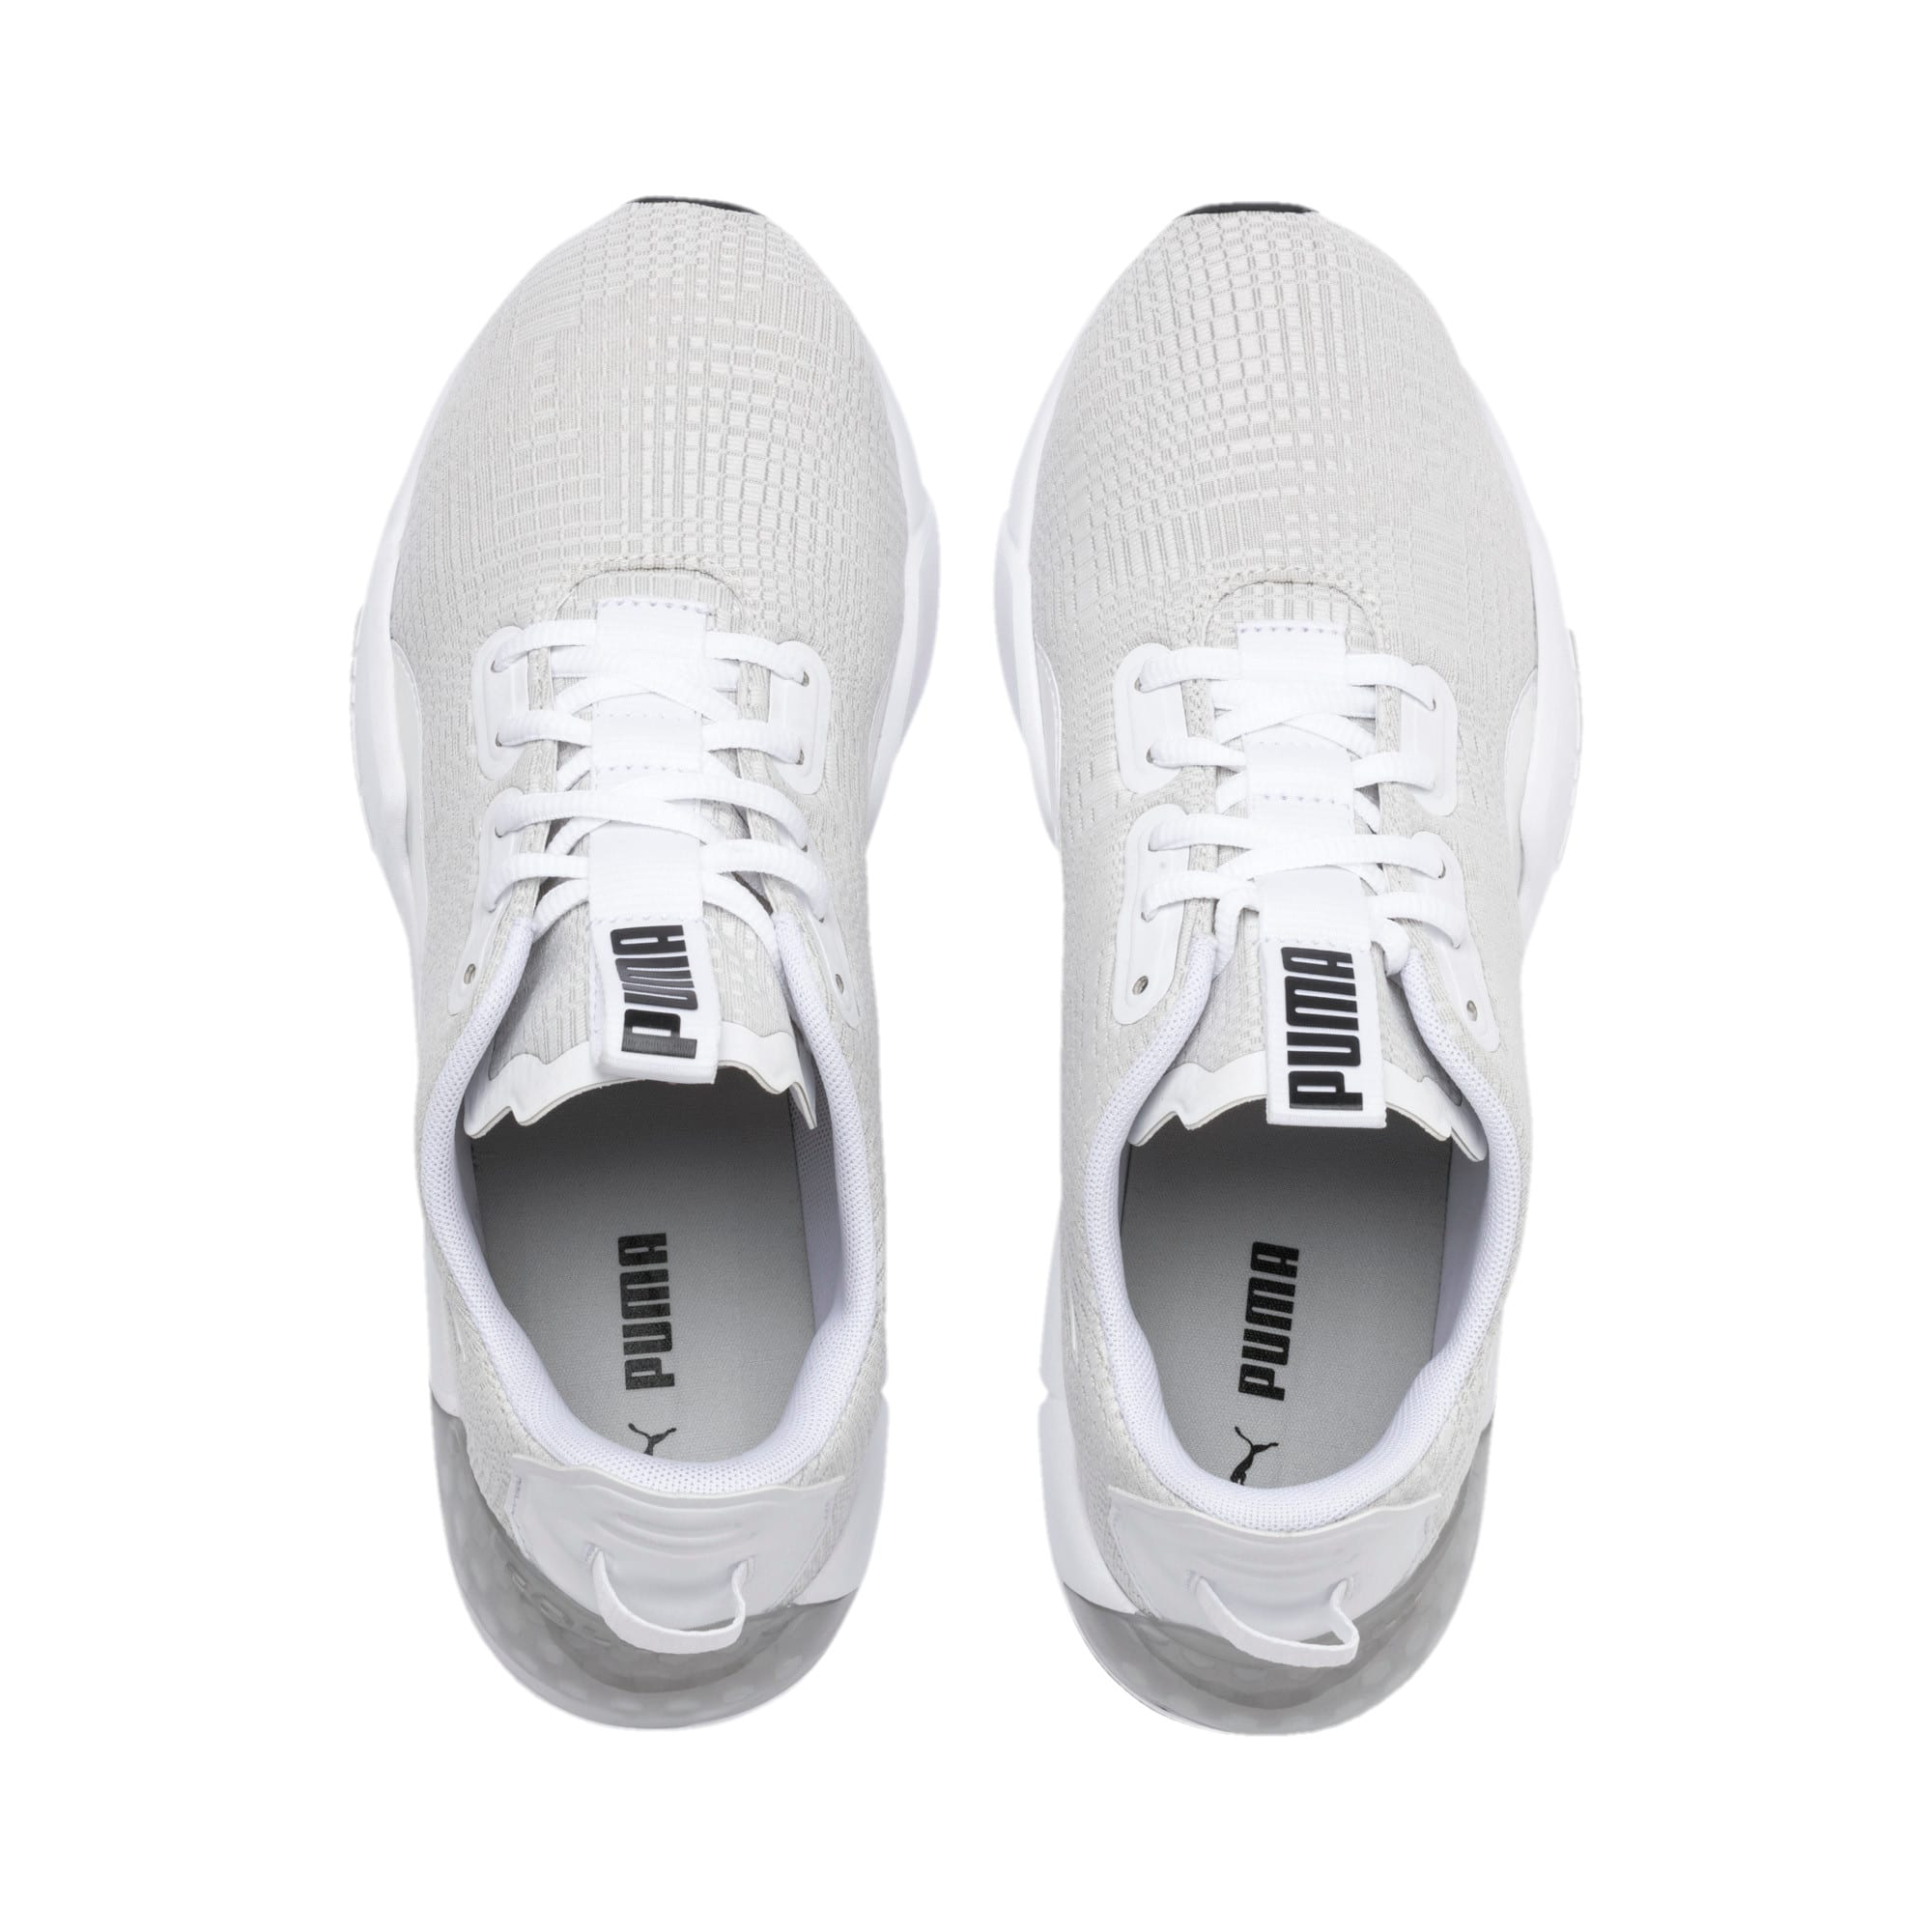 Thumbnail 7 of CELL Phase Lights Men's Training Shoes, Puma White-Gray Violet, medium